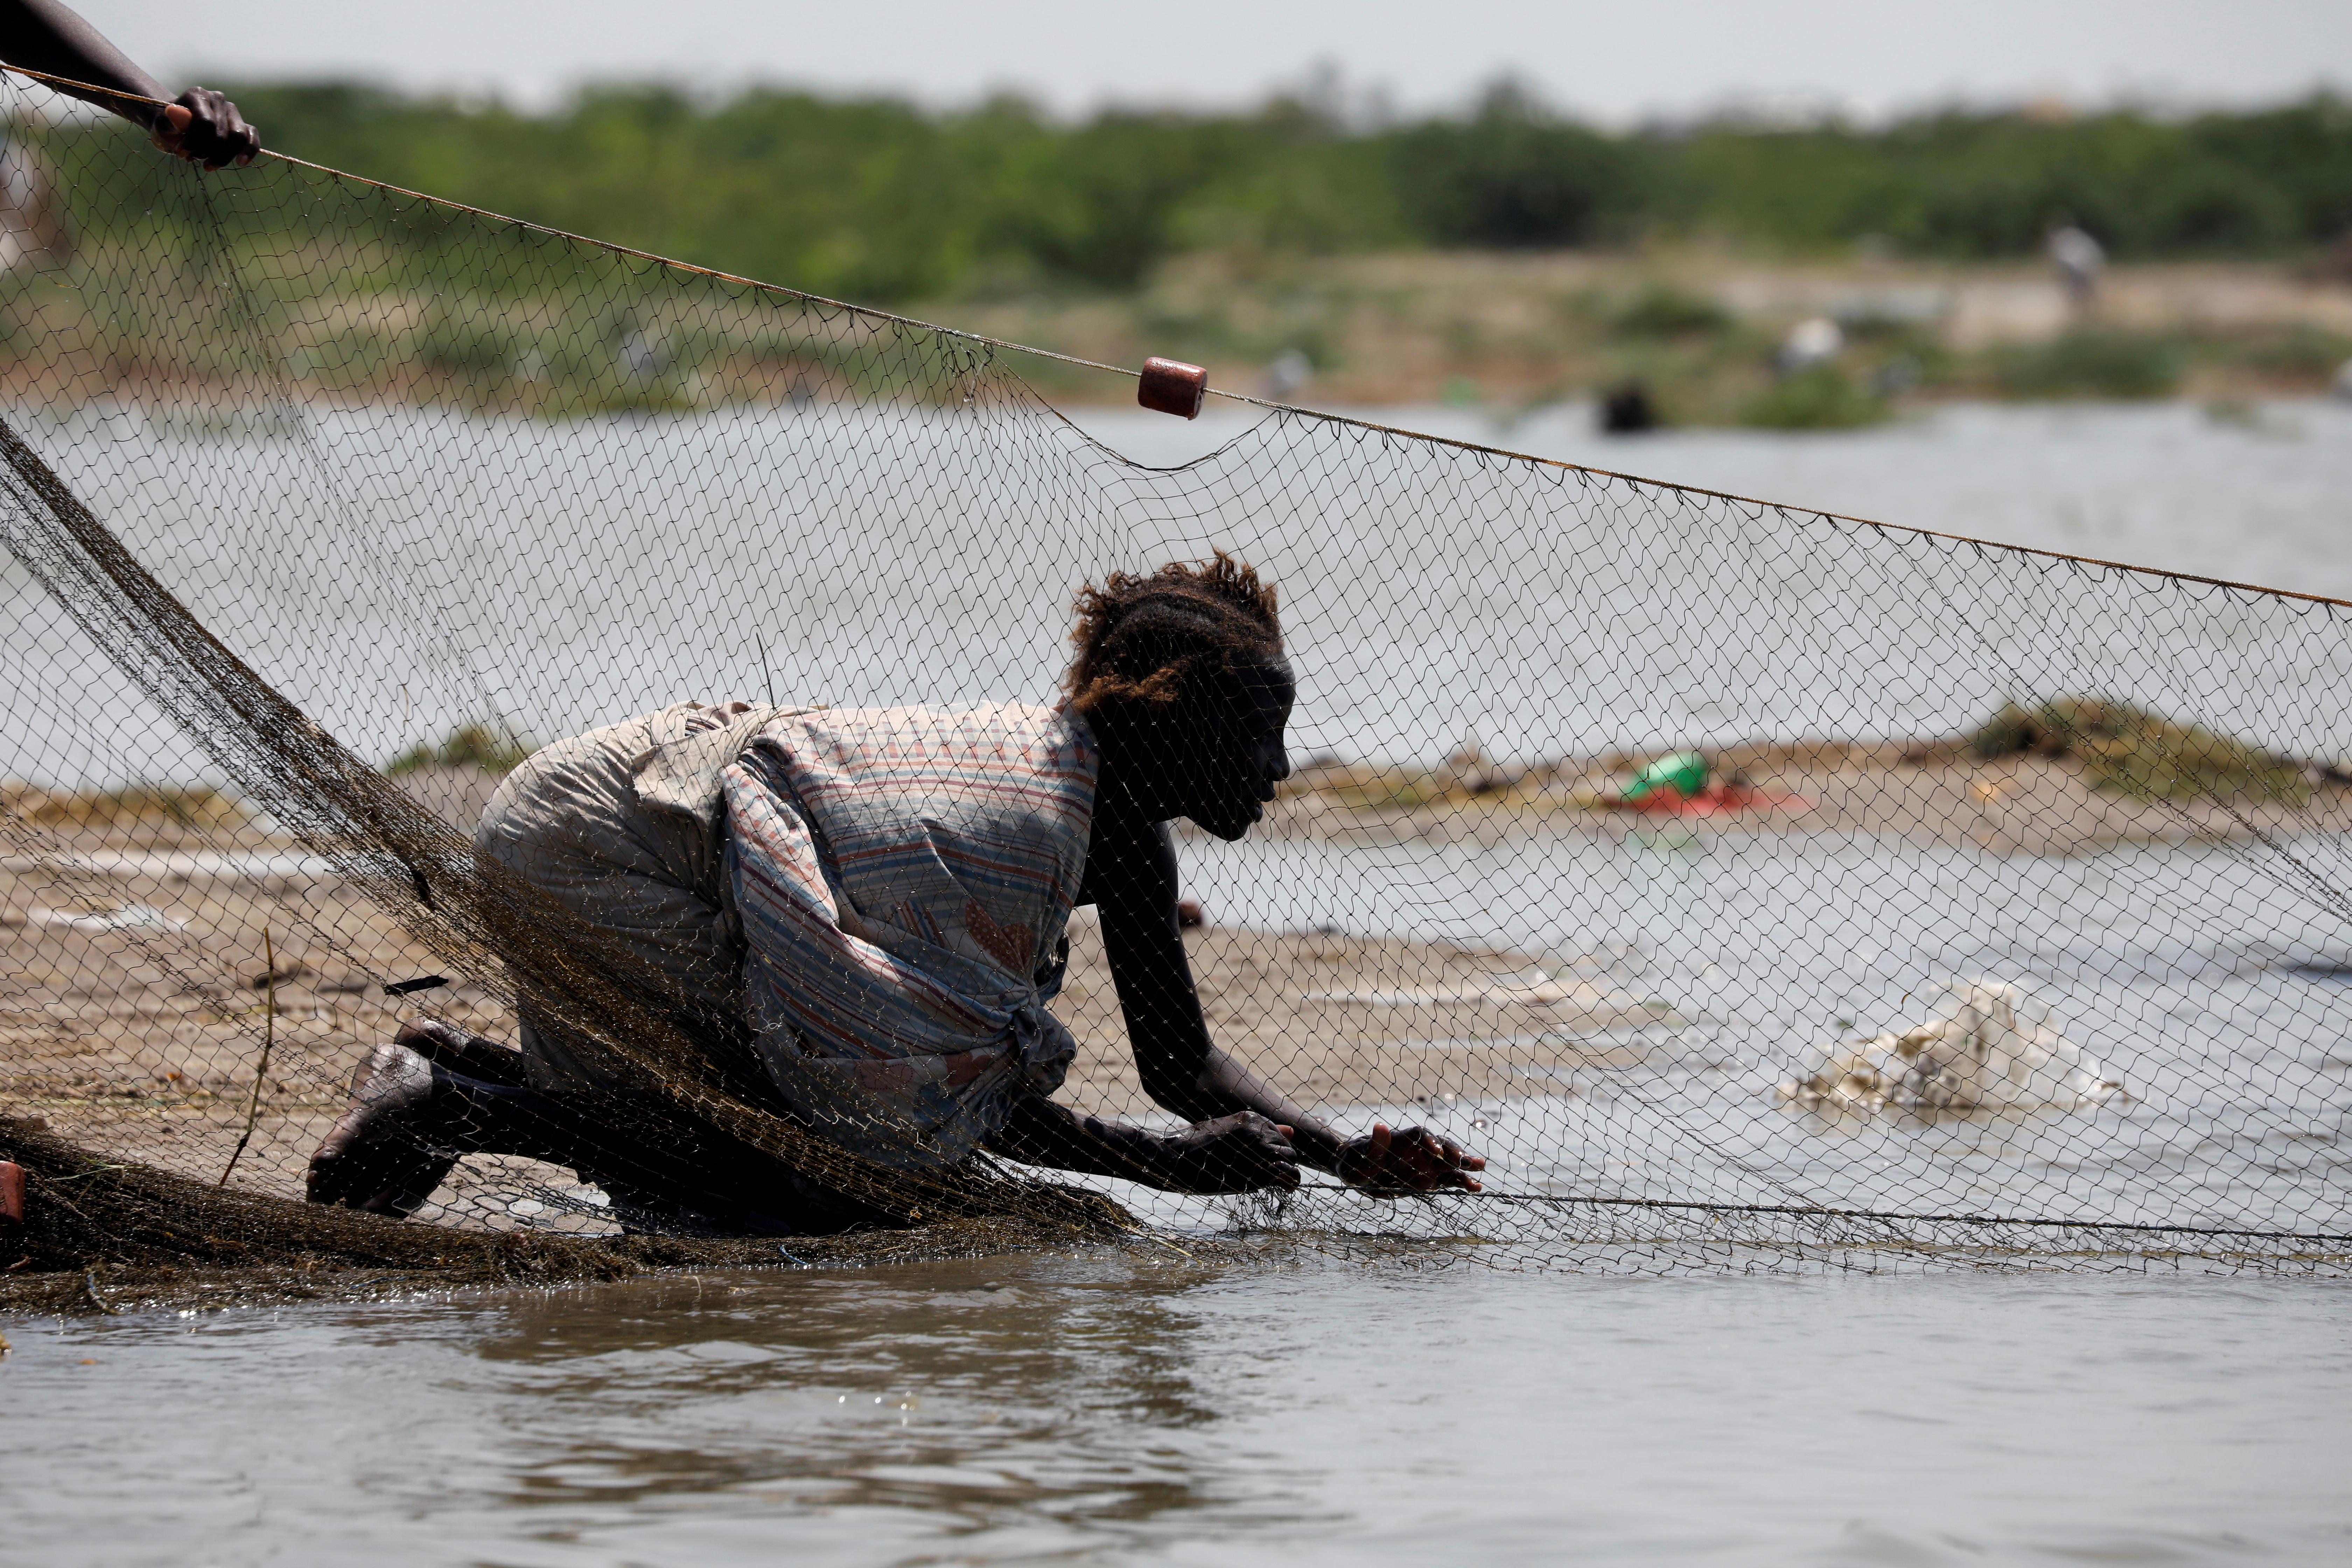 a woman pulls in a fishing net on a beach at Lake Turkana, near the town of Kalokol, Turkana county, Kenya